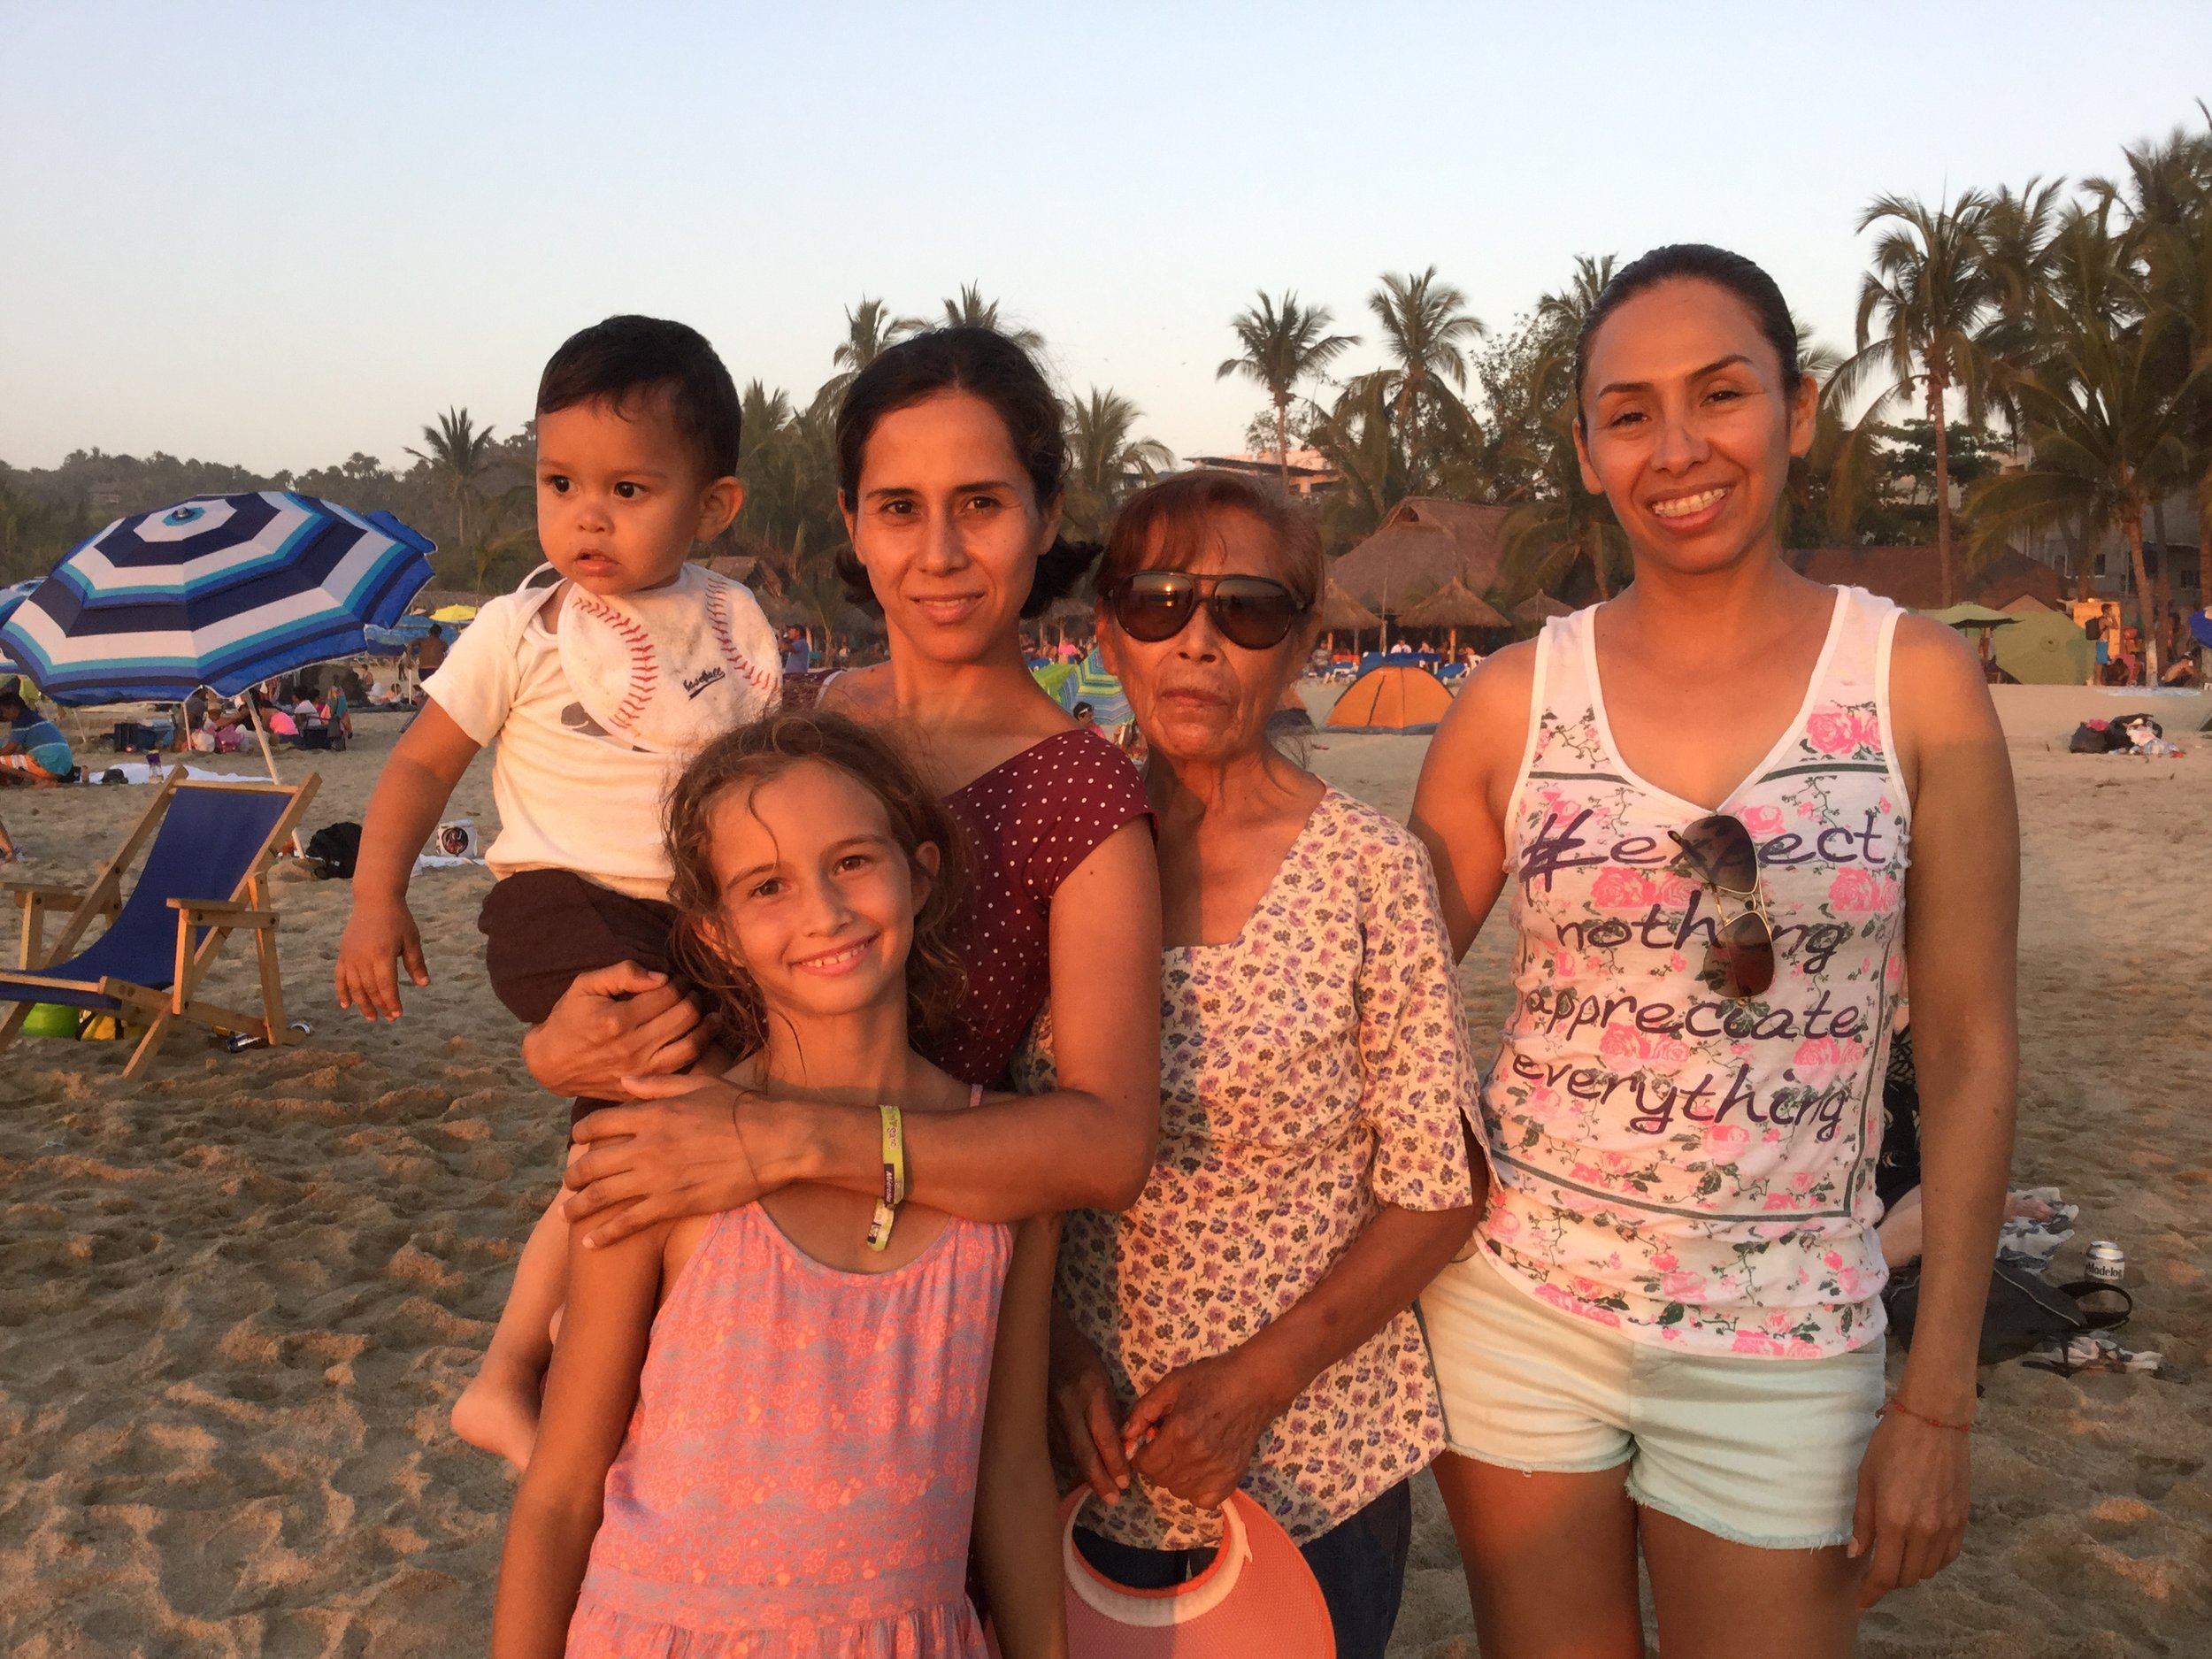 Jacob, Lili, Dr. Grethel, señora Lidia and Alfa.